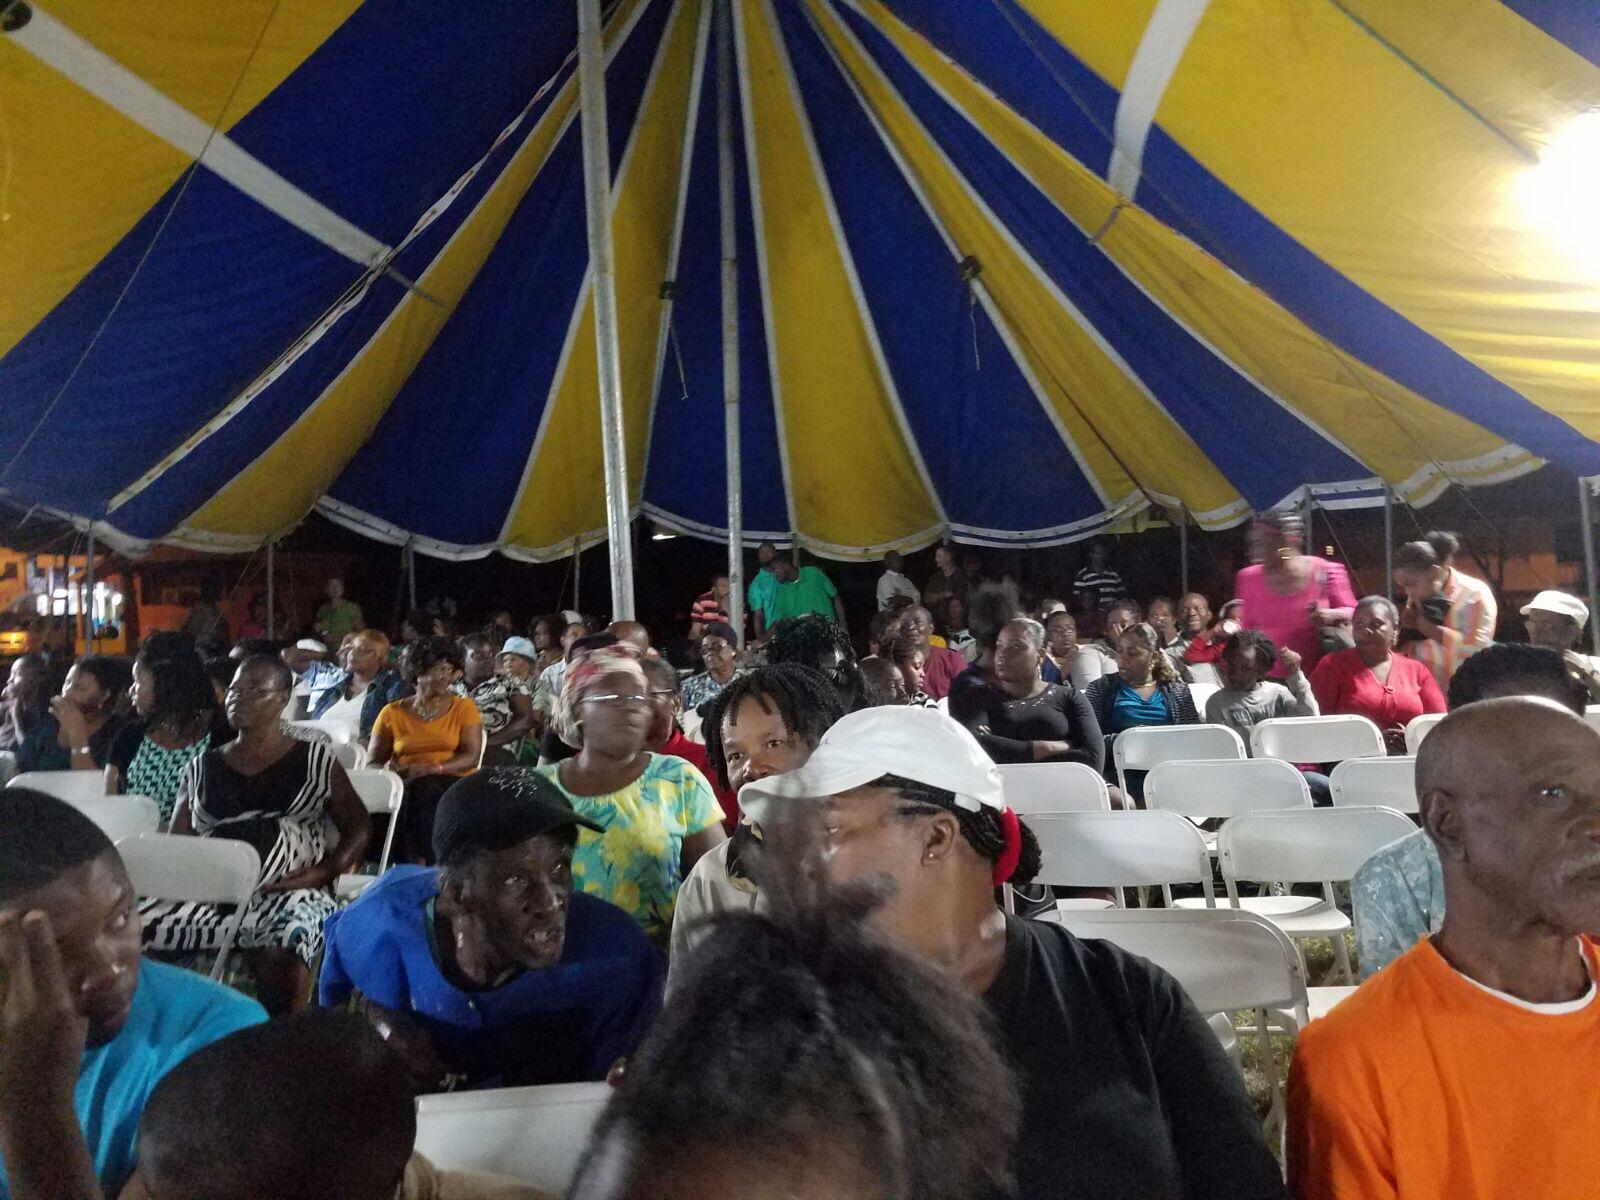 TENT CRUSADE in DOMINICA